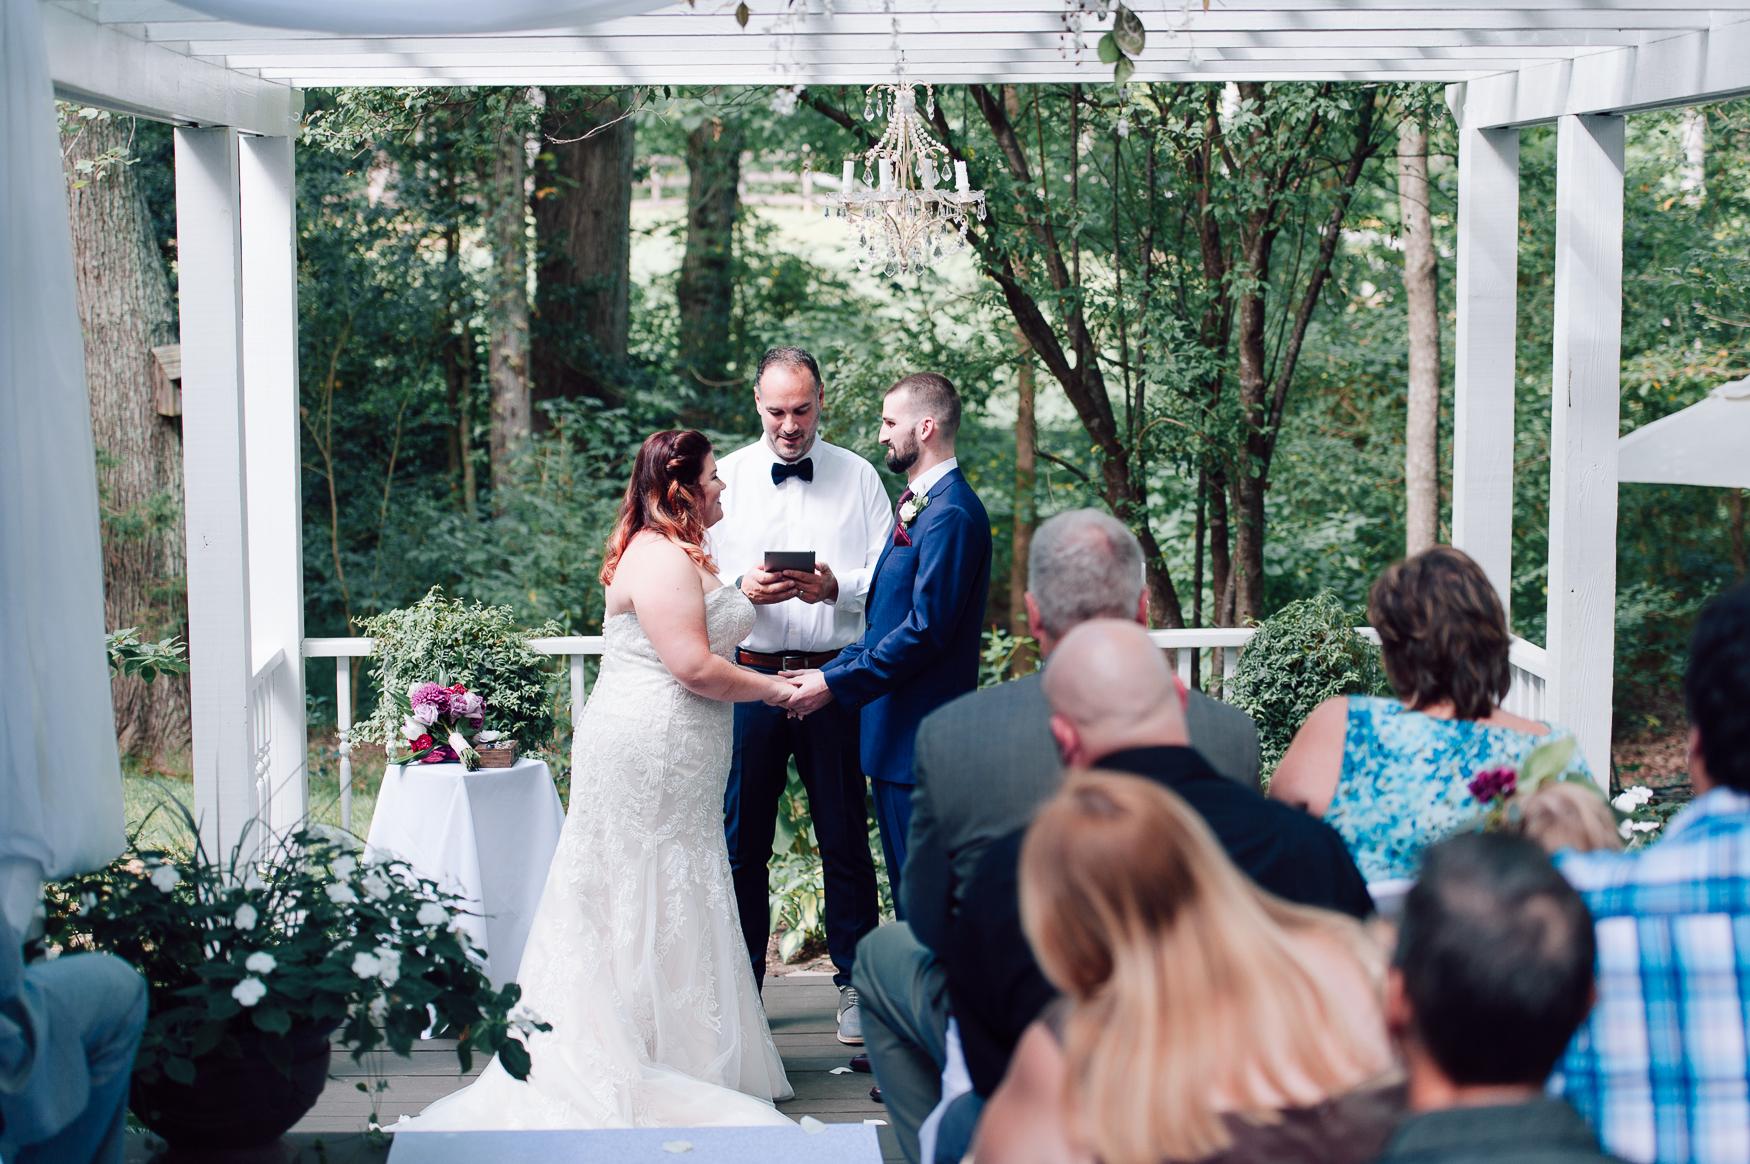 virginiawedding_GlenGarden_rusticwedding_fredericksburg_youseephotography_KellySteven (33).jpg